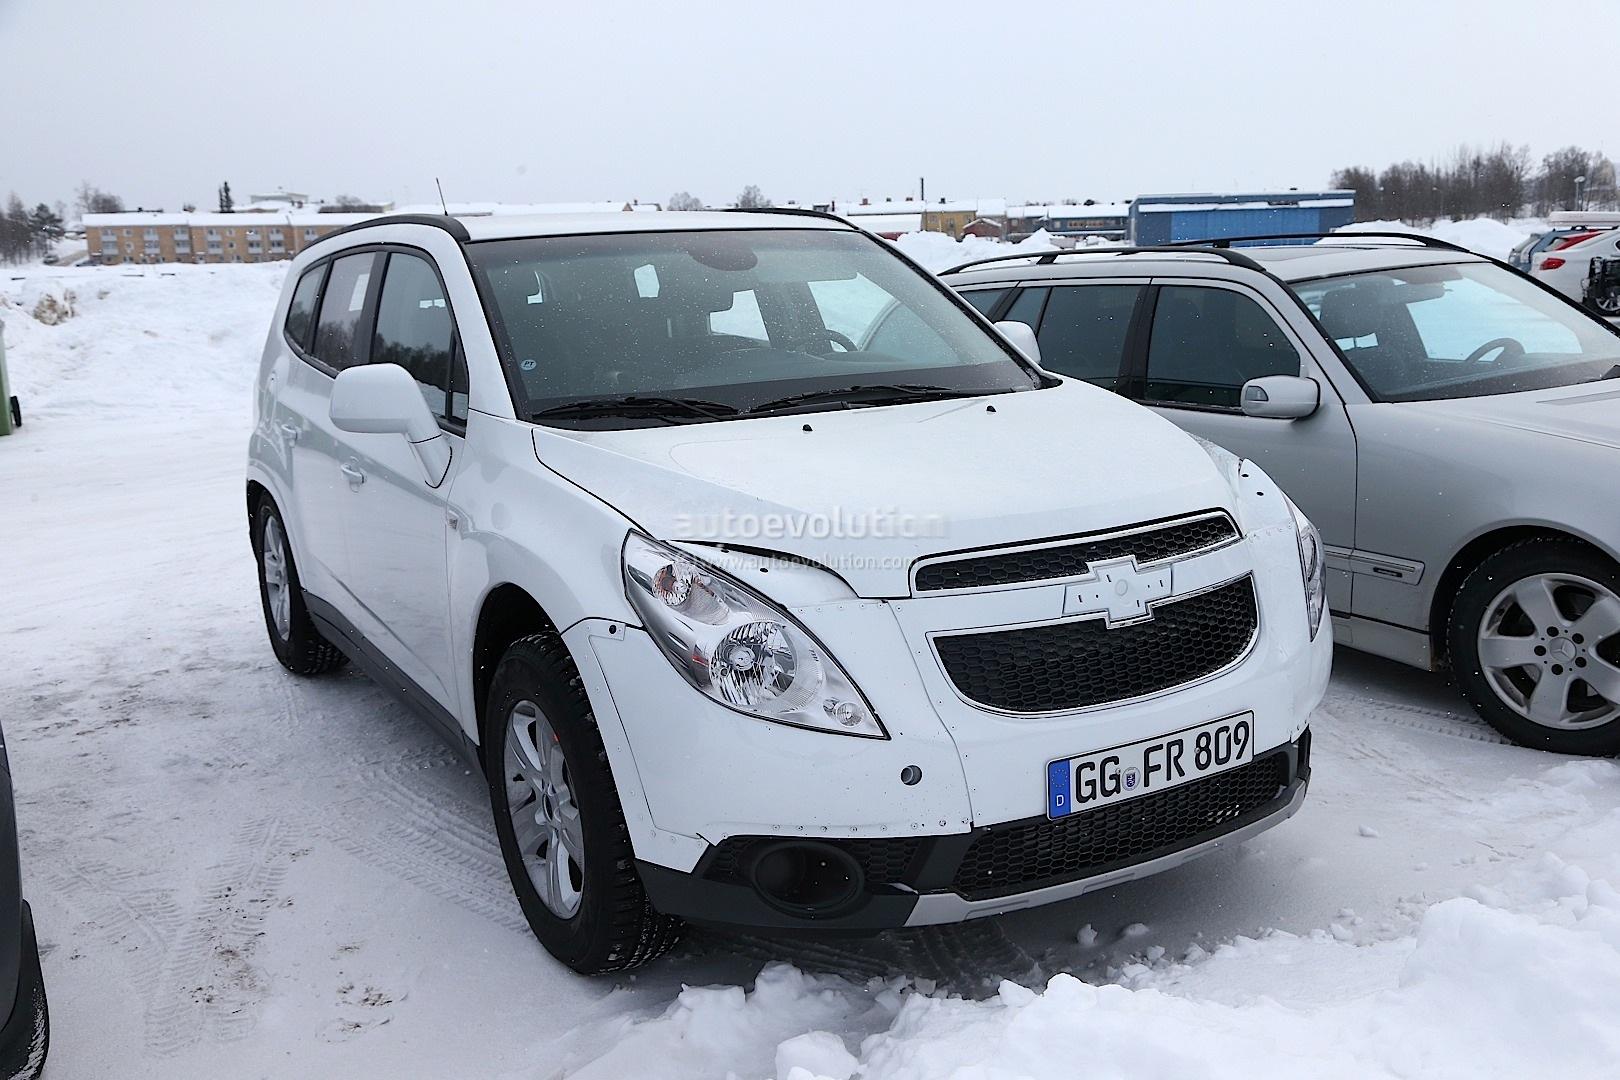 Spyshots Opel Antara Chevrolet Captiva Suv Test Mules